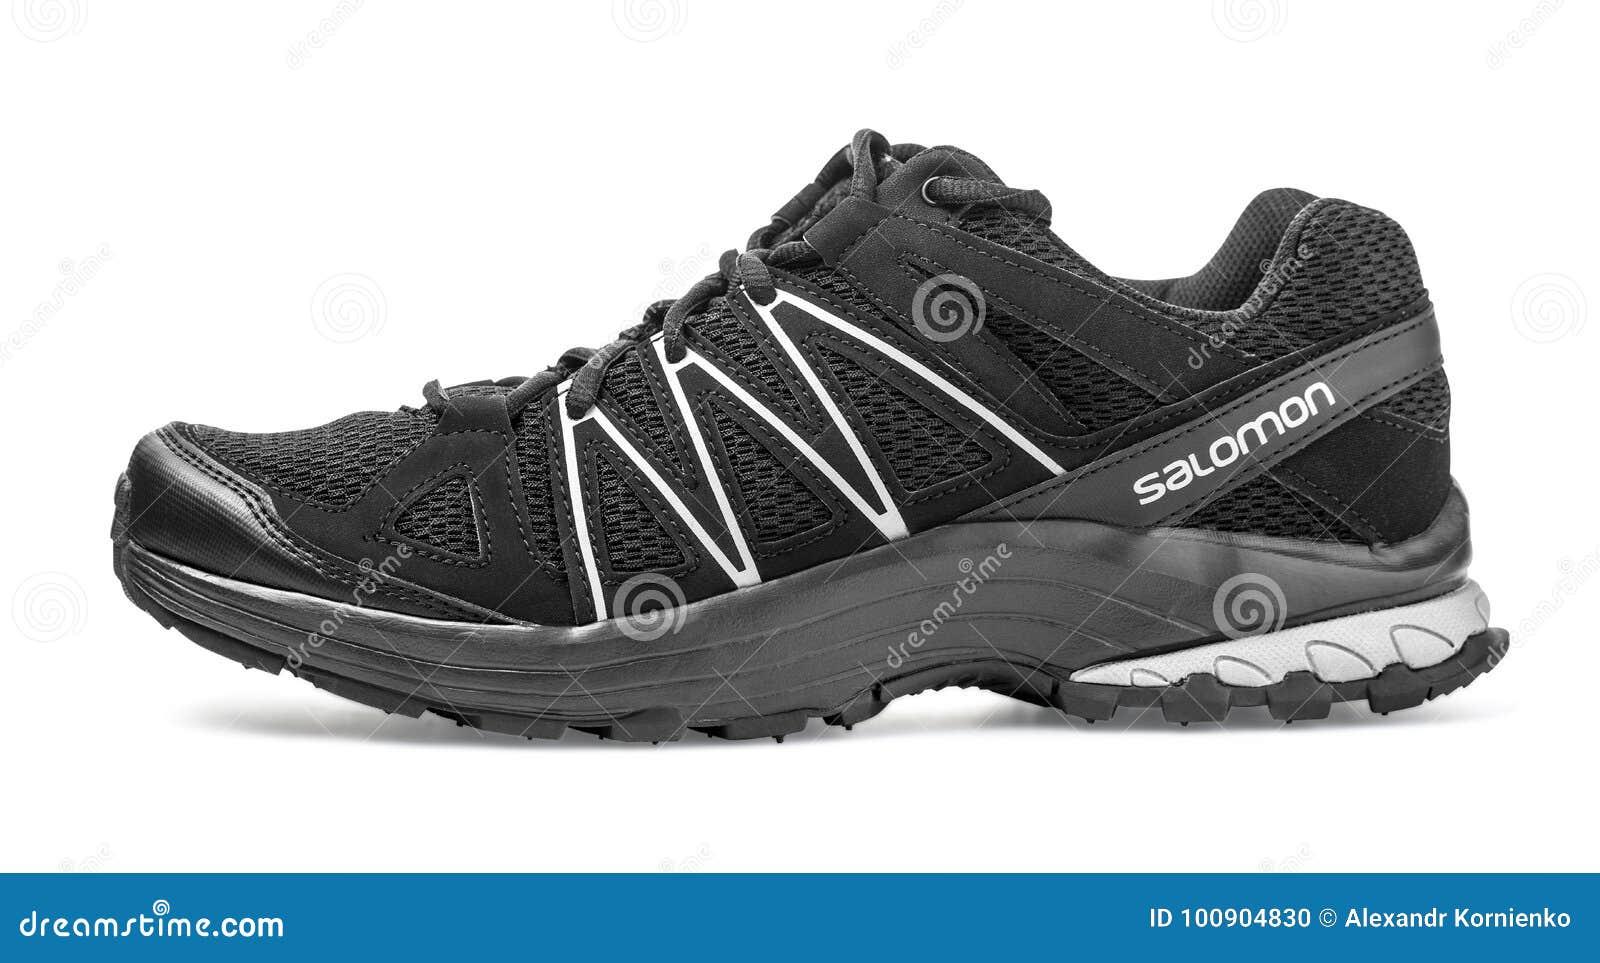 Salomon trail running shoe editorial